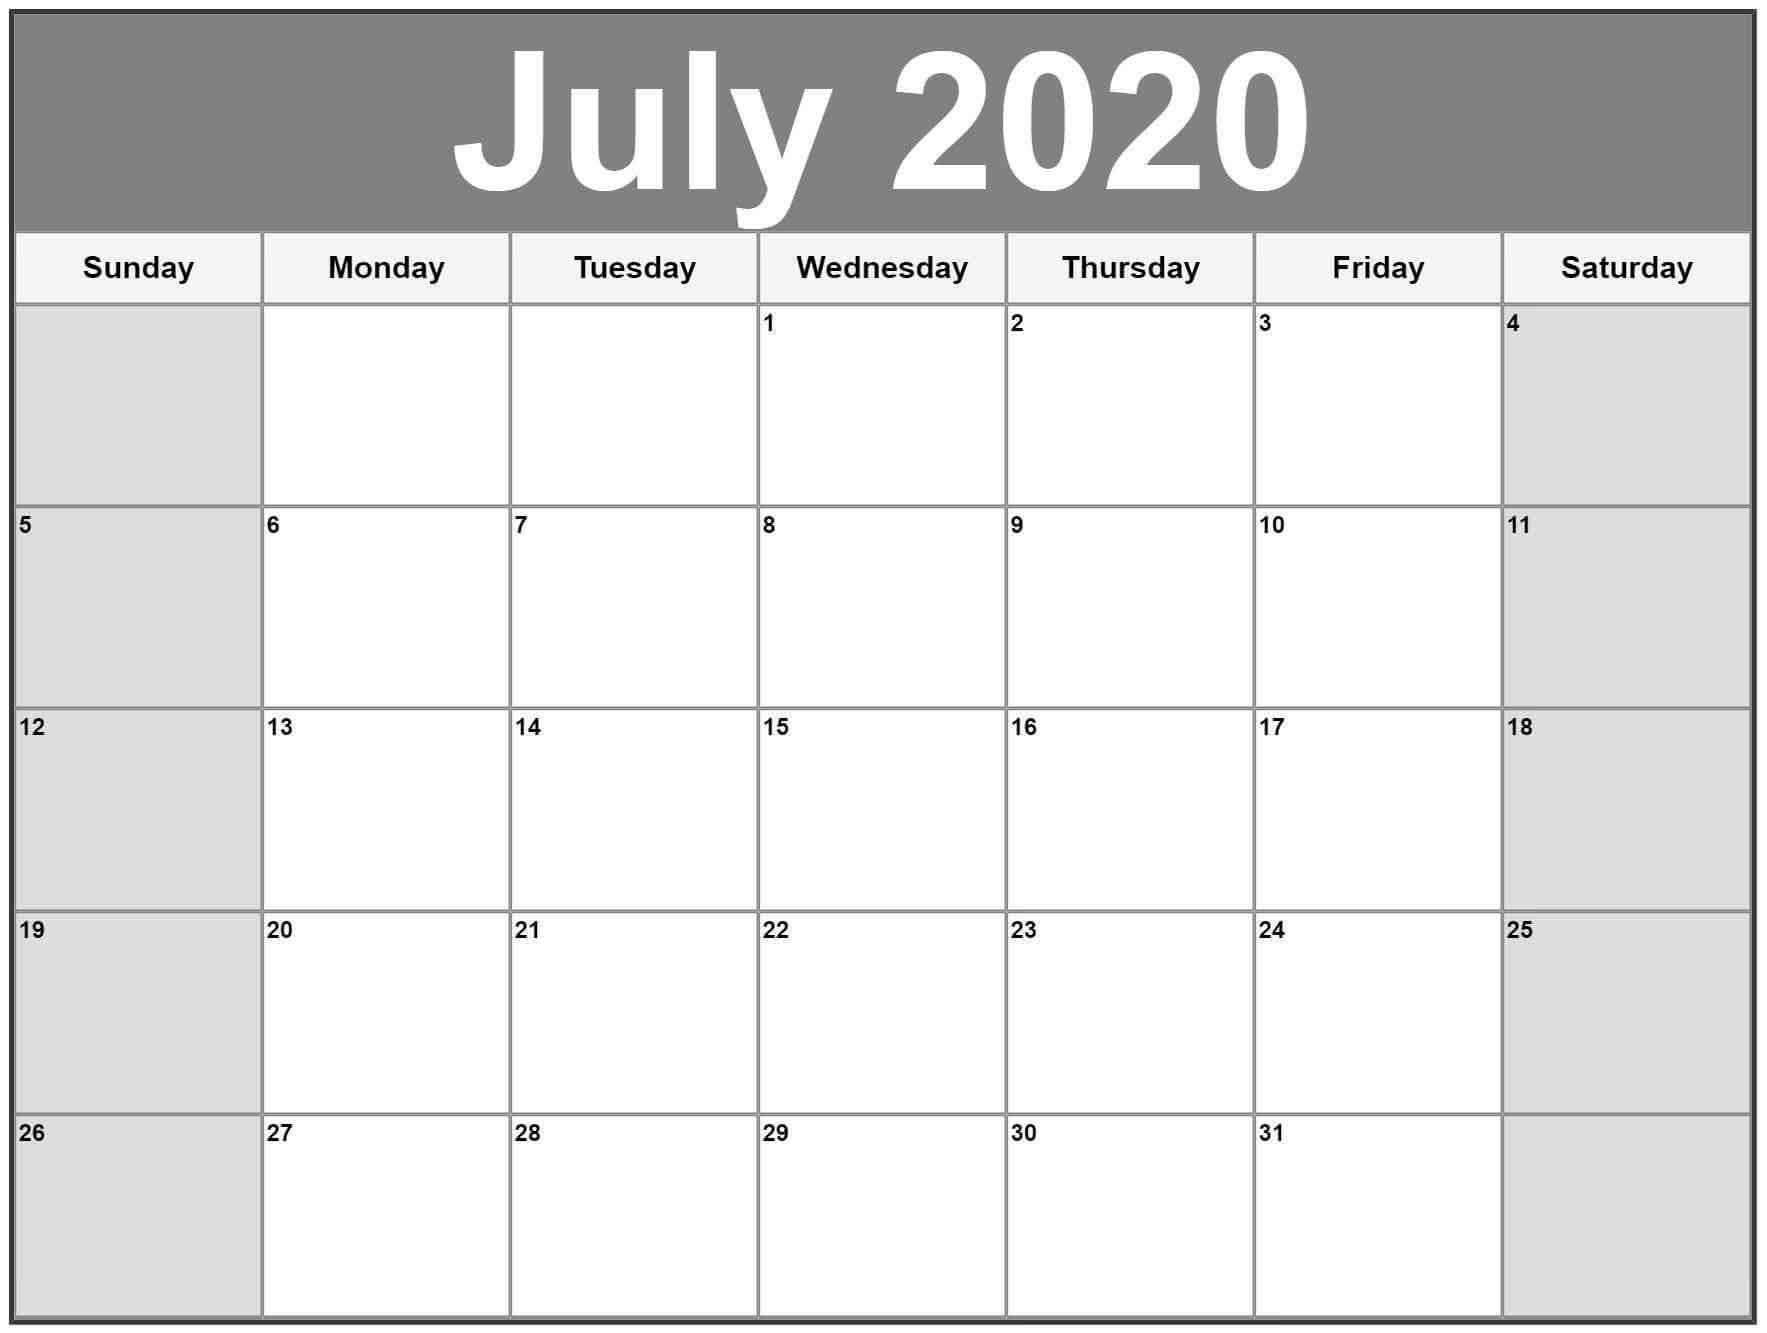 July 2020 Calendar Blank Template